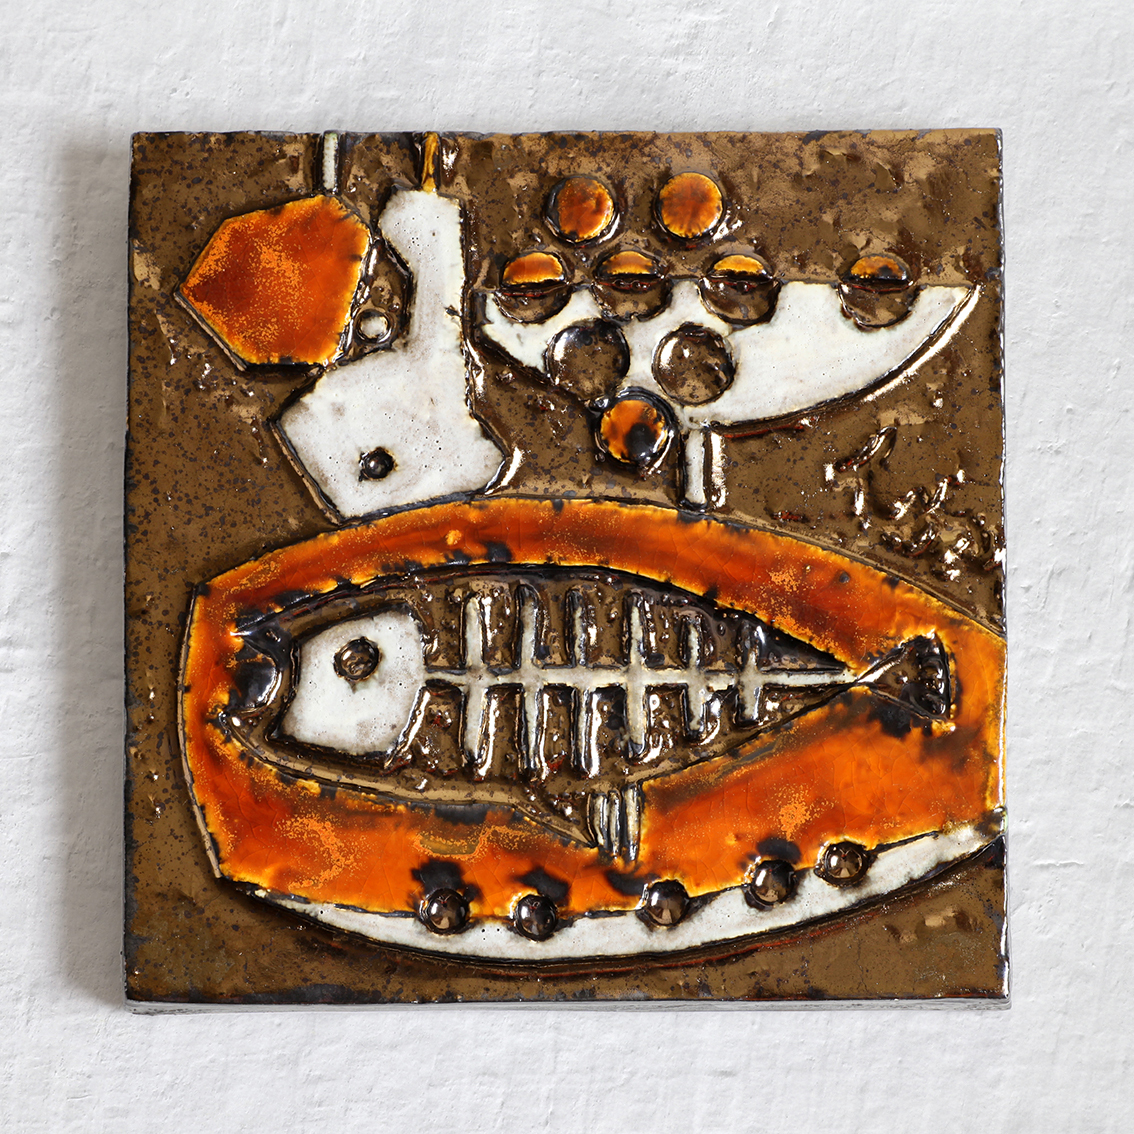 Helmut Schaffenacker ヘルムート シェーフェナッカー 魚と果物の陶板 ヴィンテージ